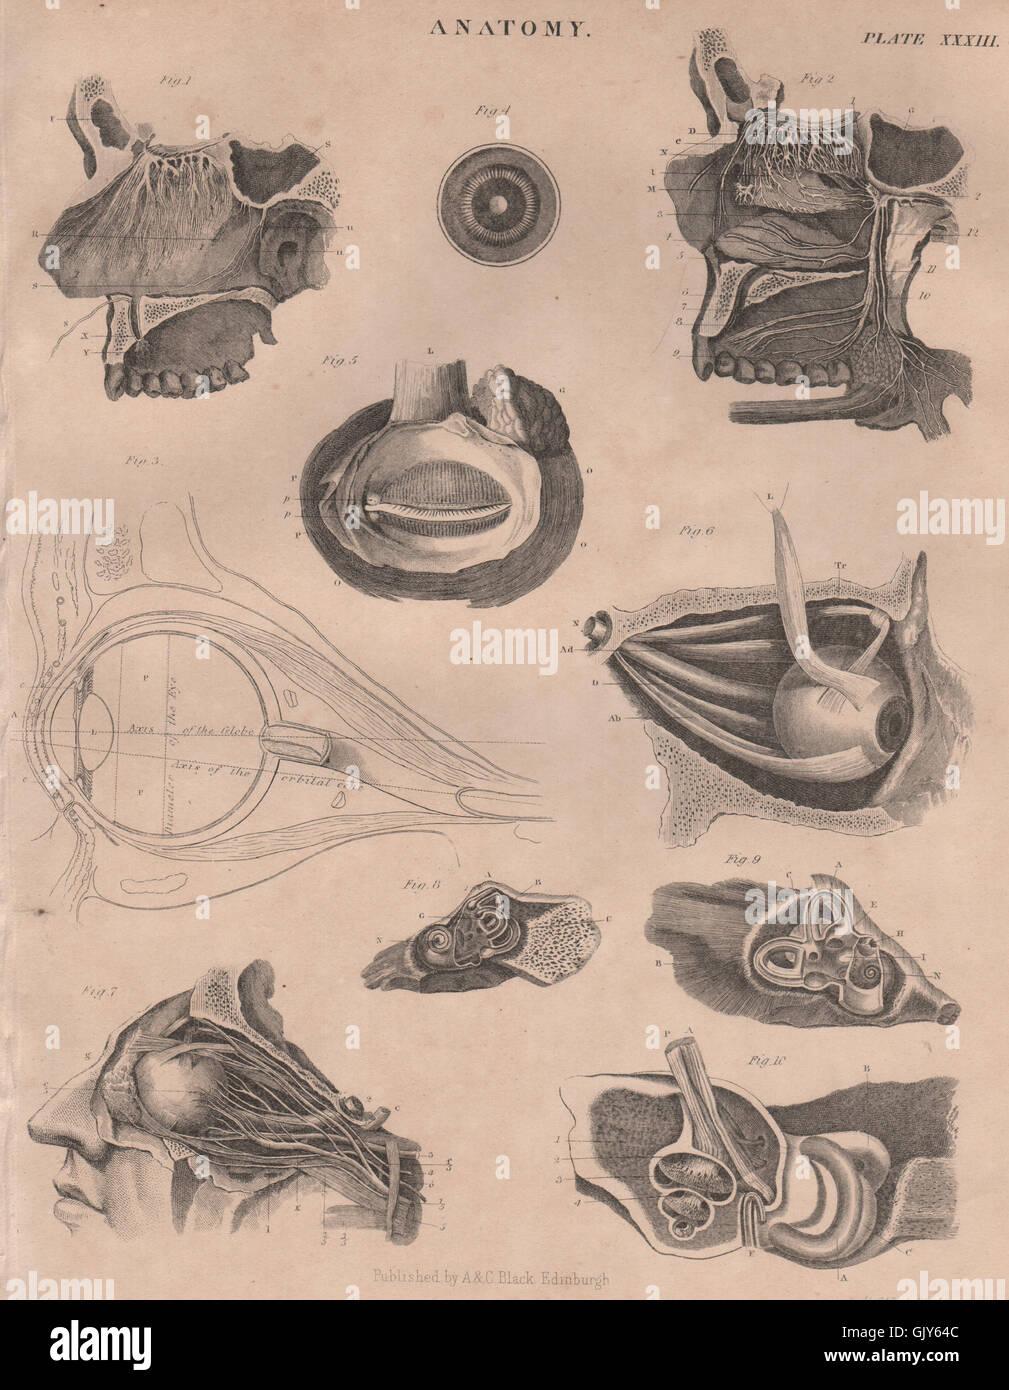 Human Anatomy Eyes Eyeballs Britannica Antique Print 1860 Stock